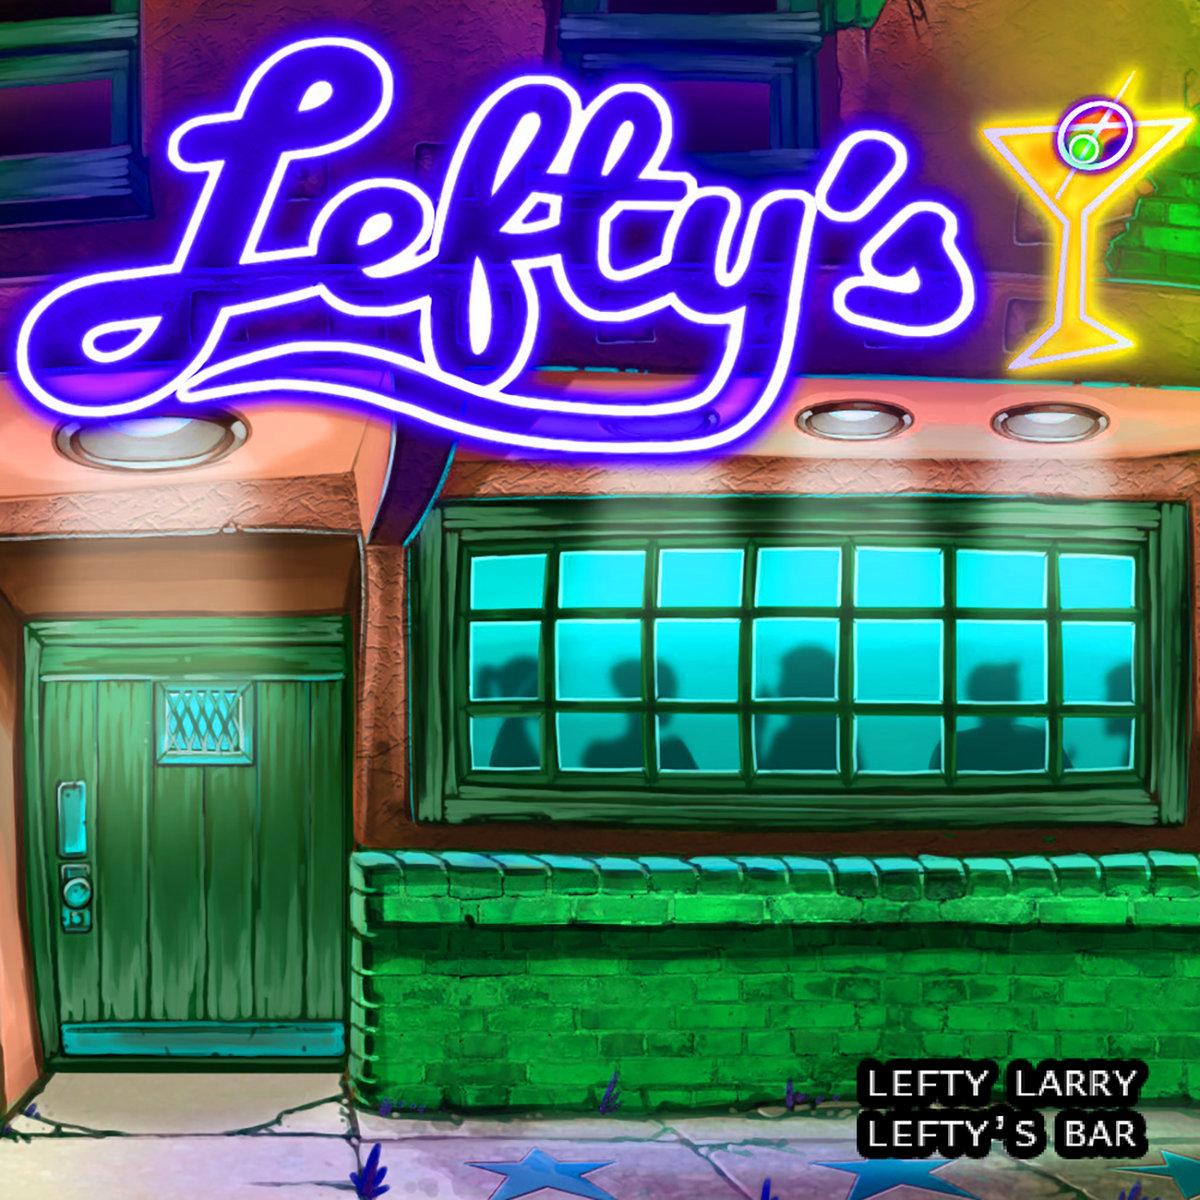 Lefty's Bar cover